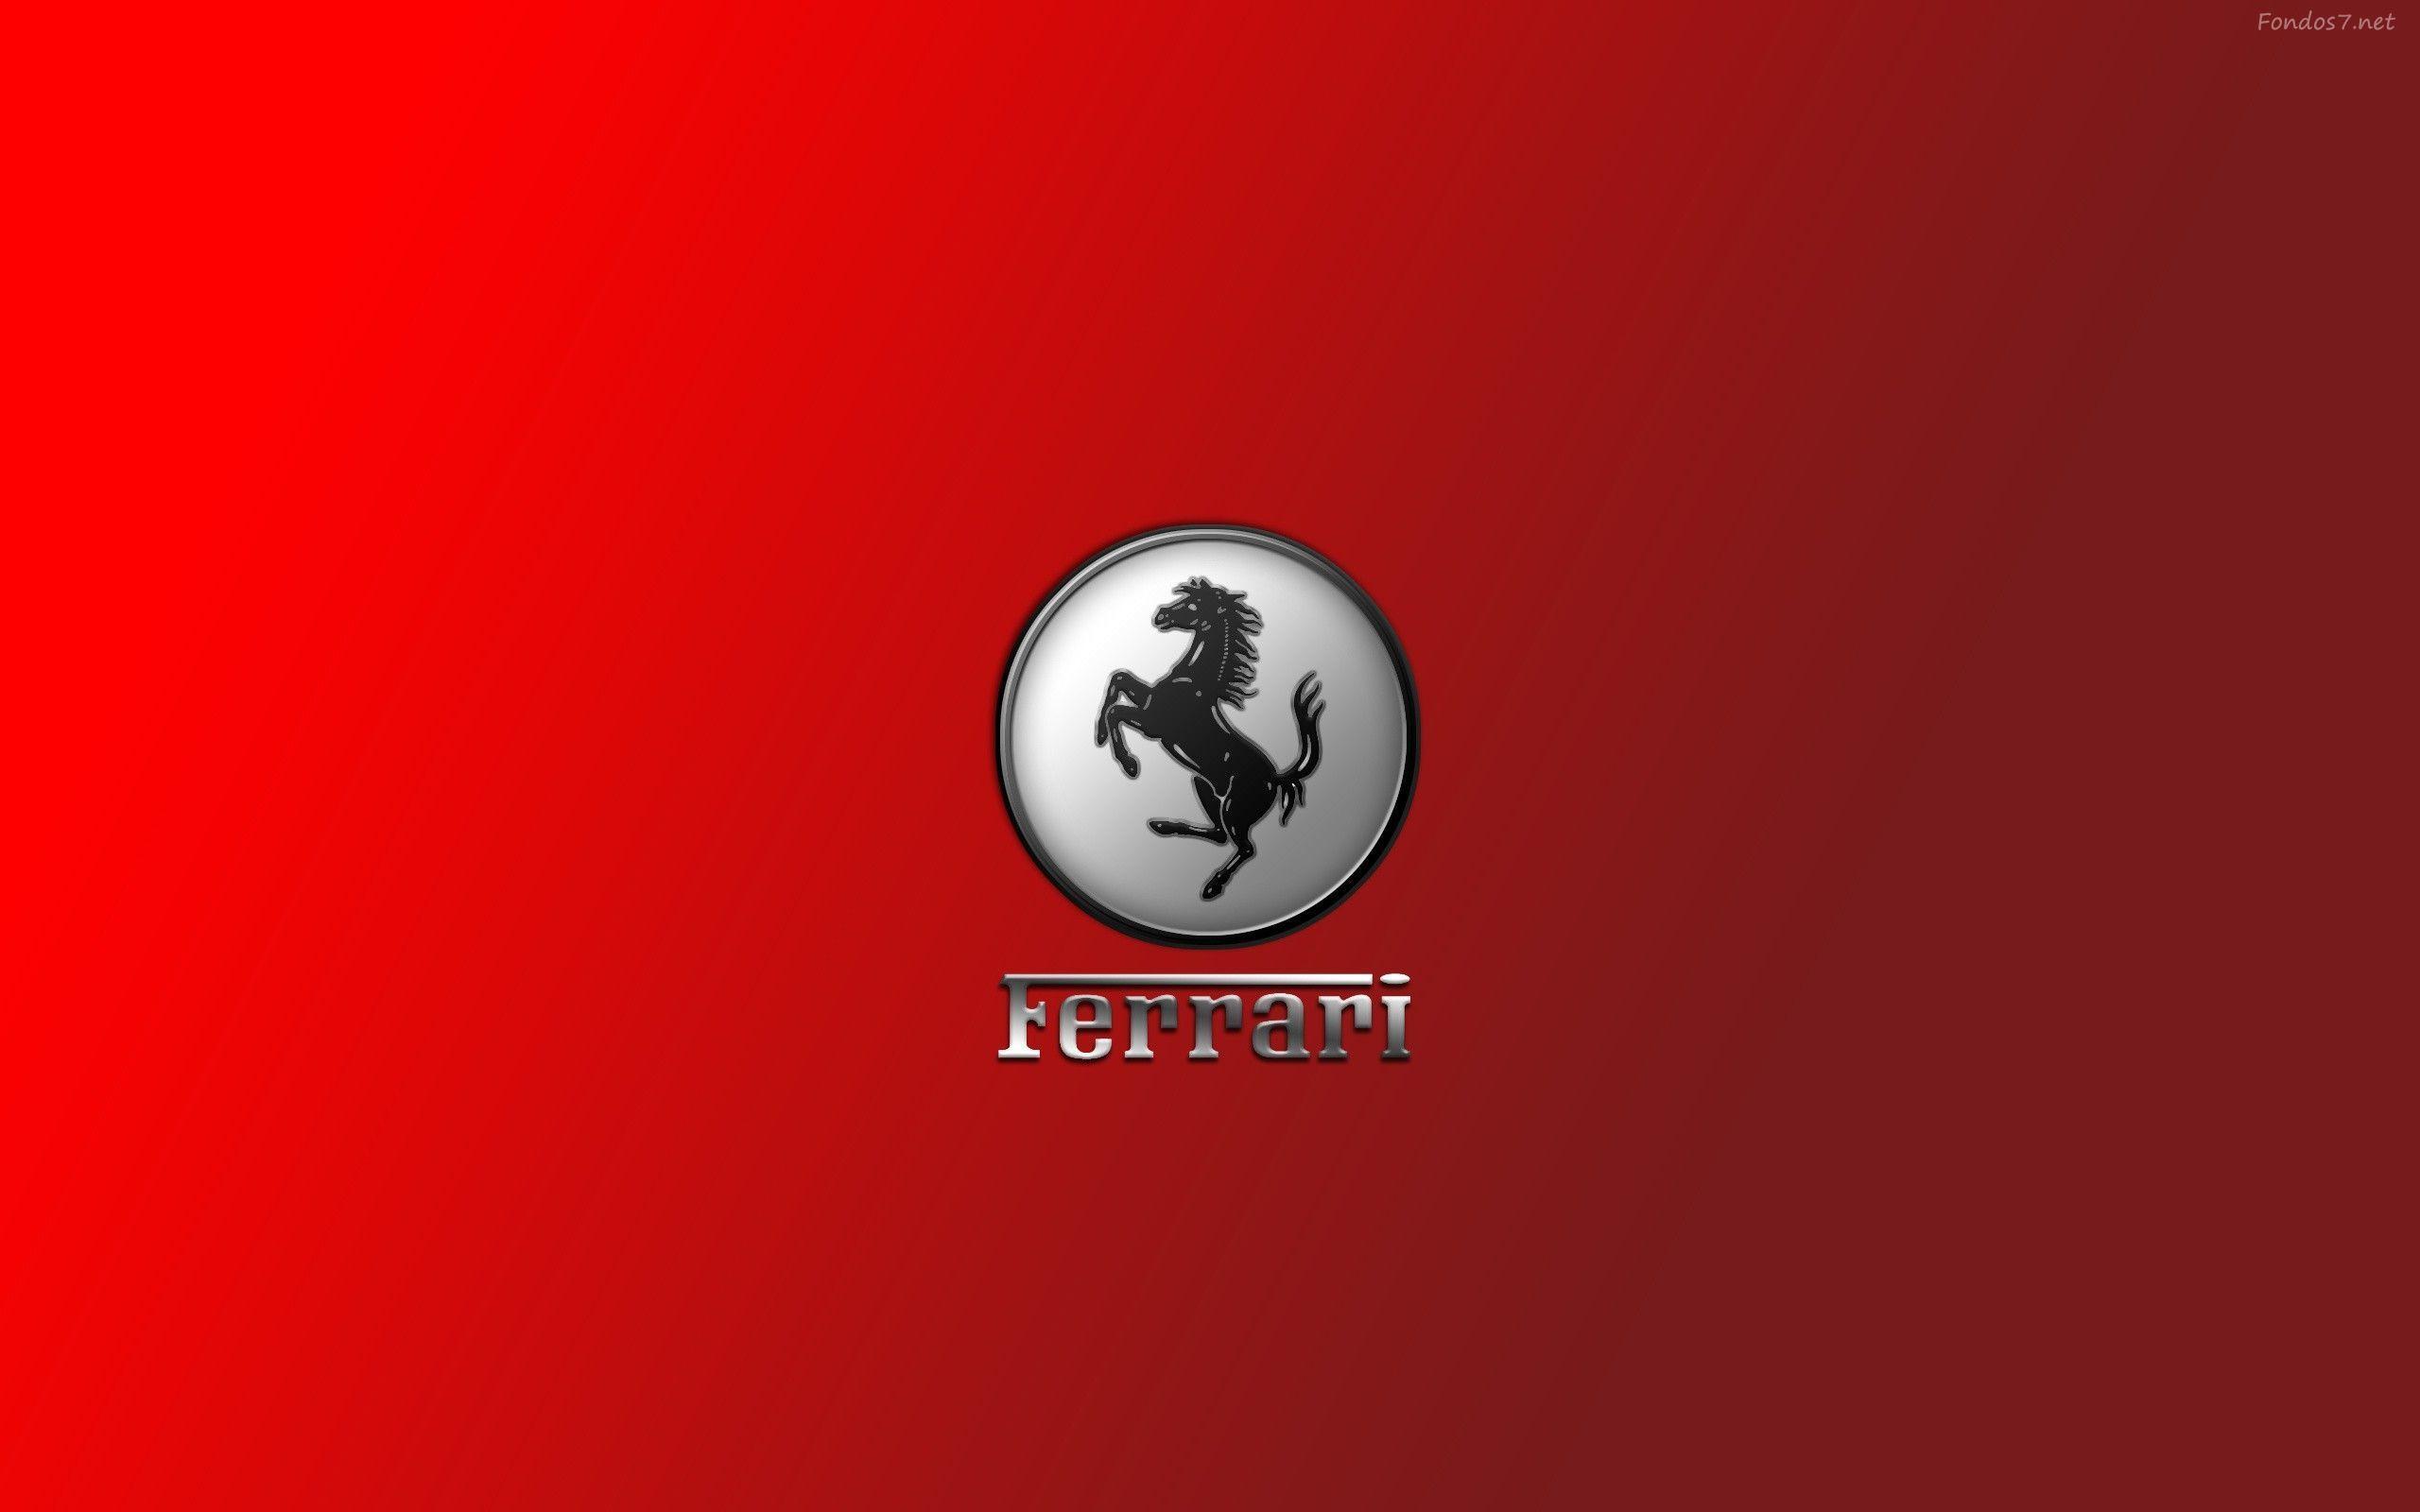 Ferrari Logo Wallpapers - JoJo PixJoJo Pix